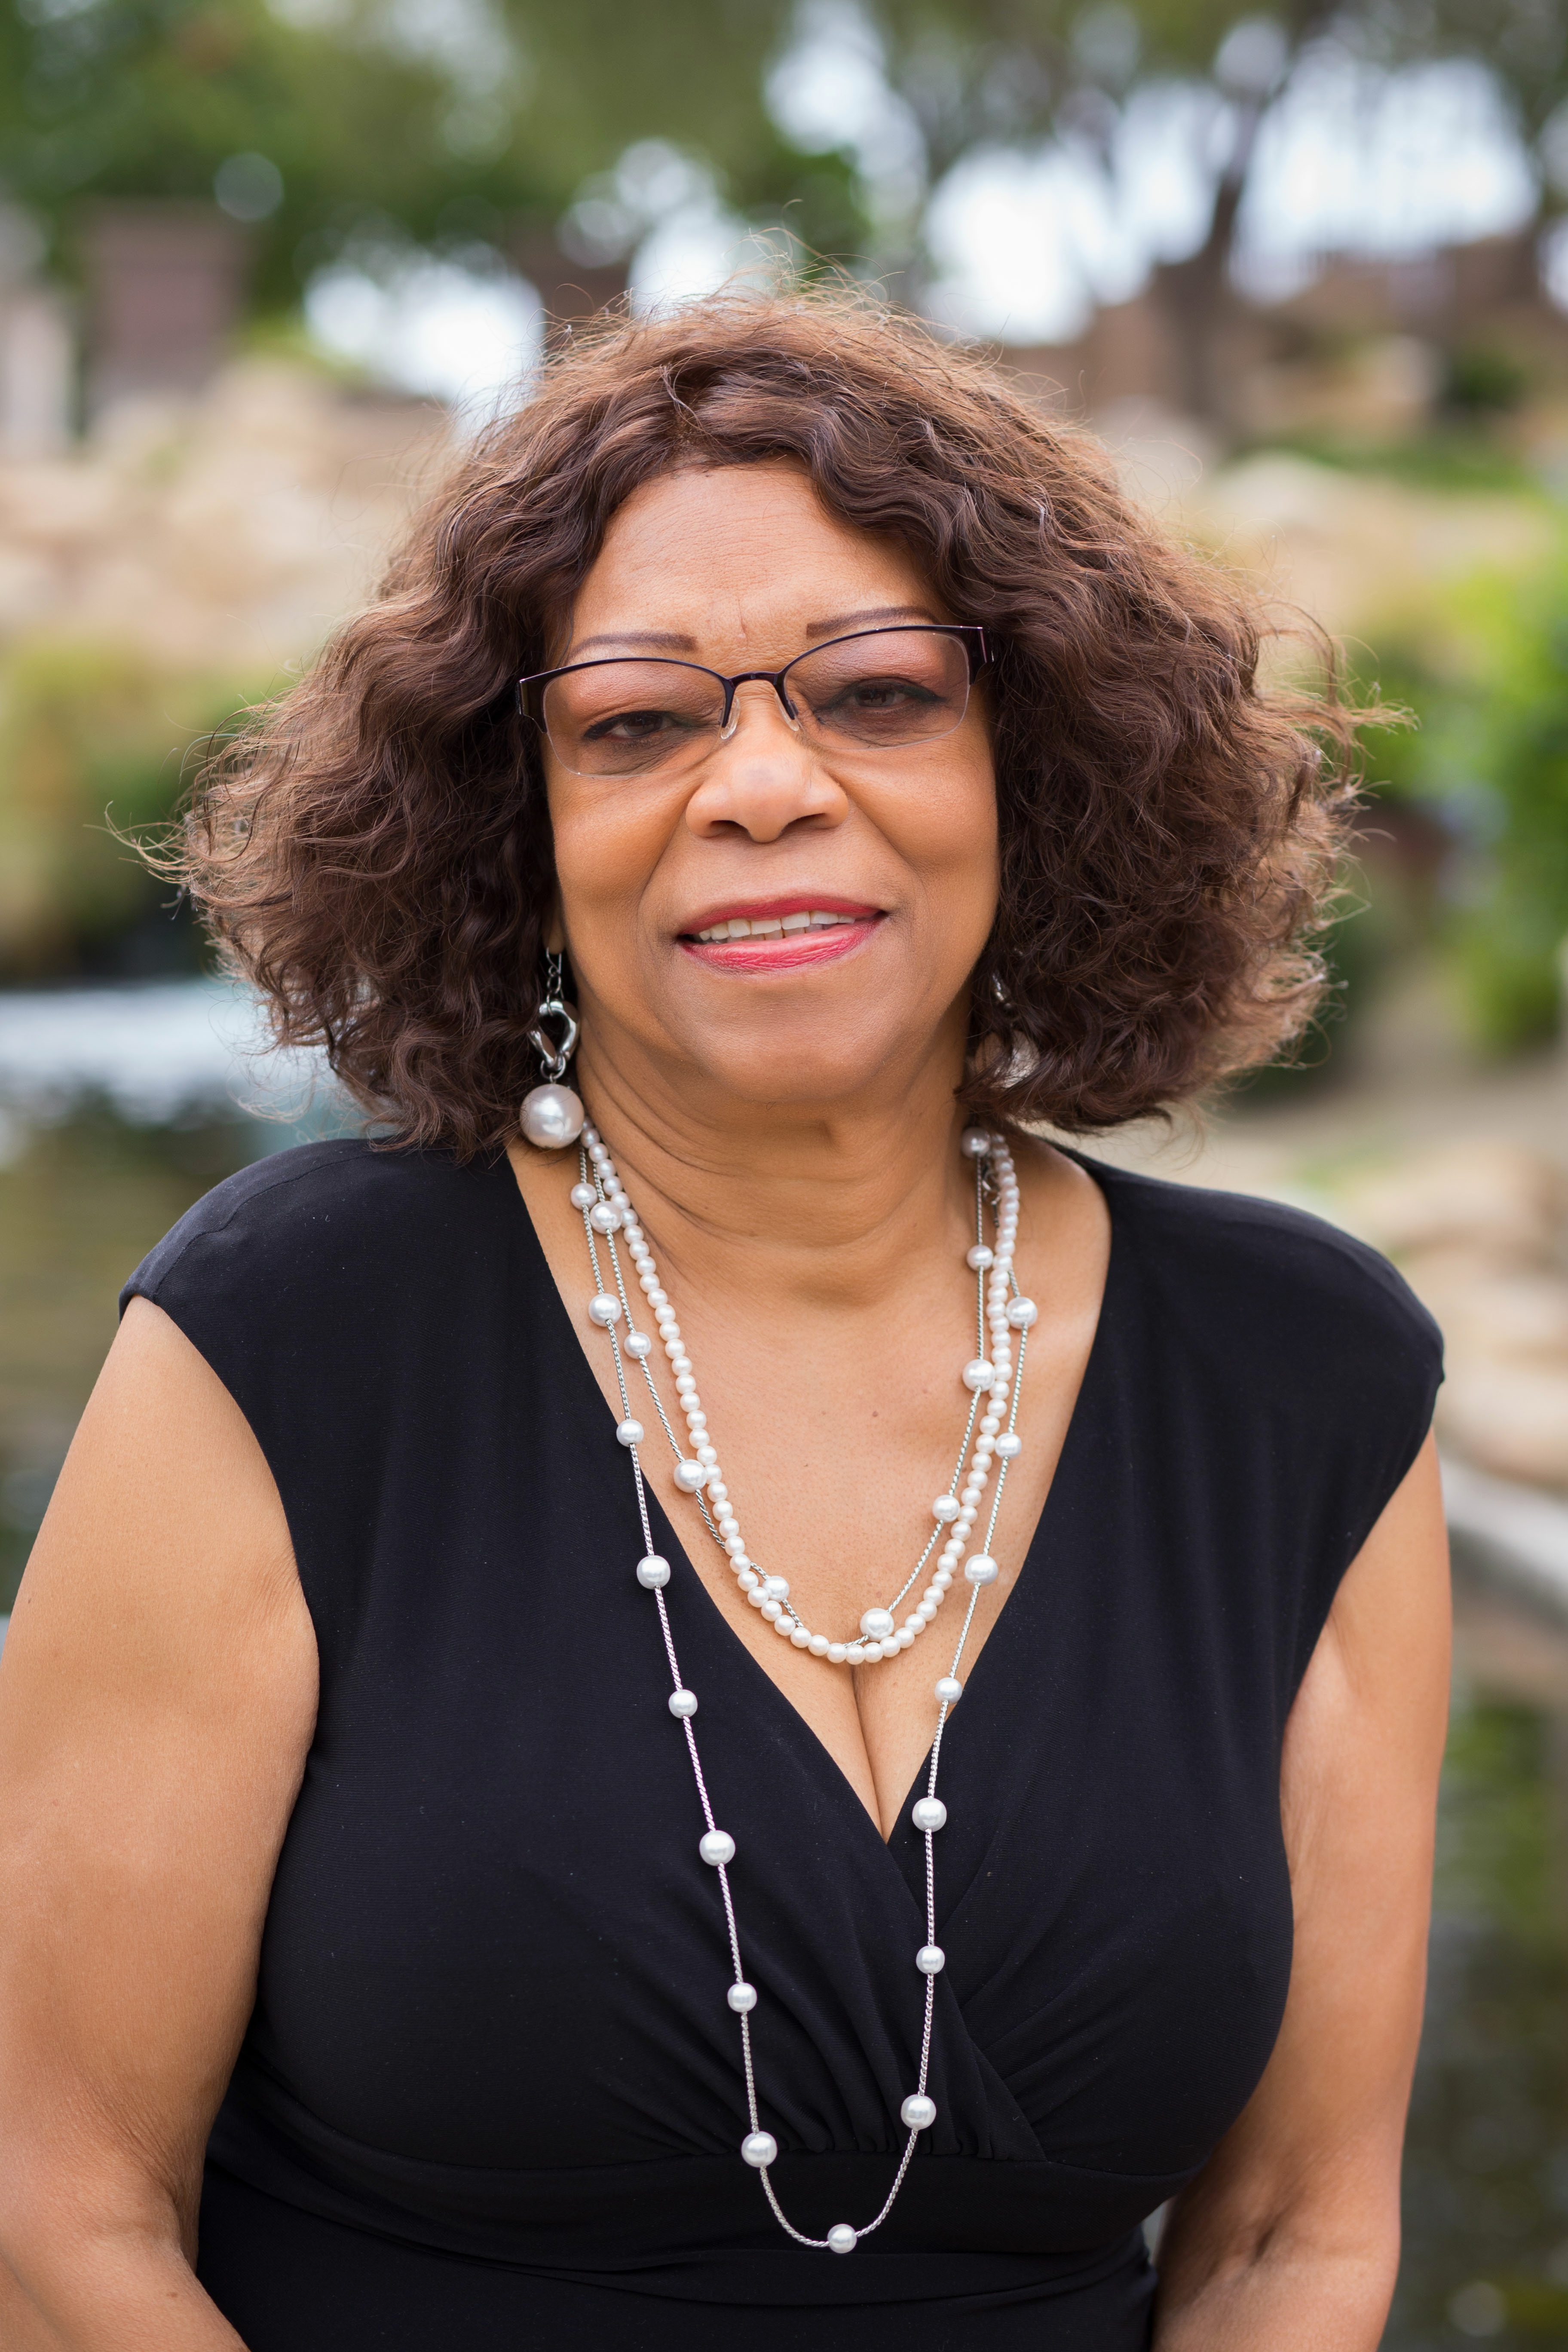 Margie Miles, 12th President